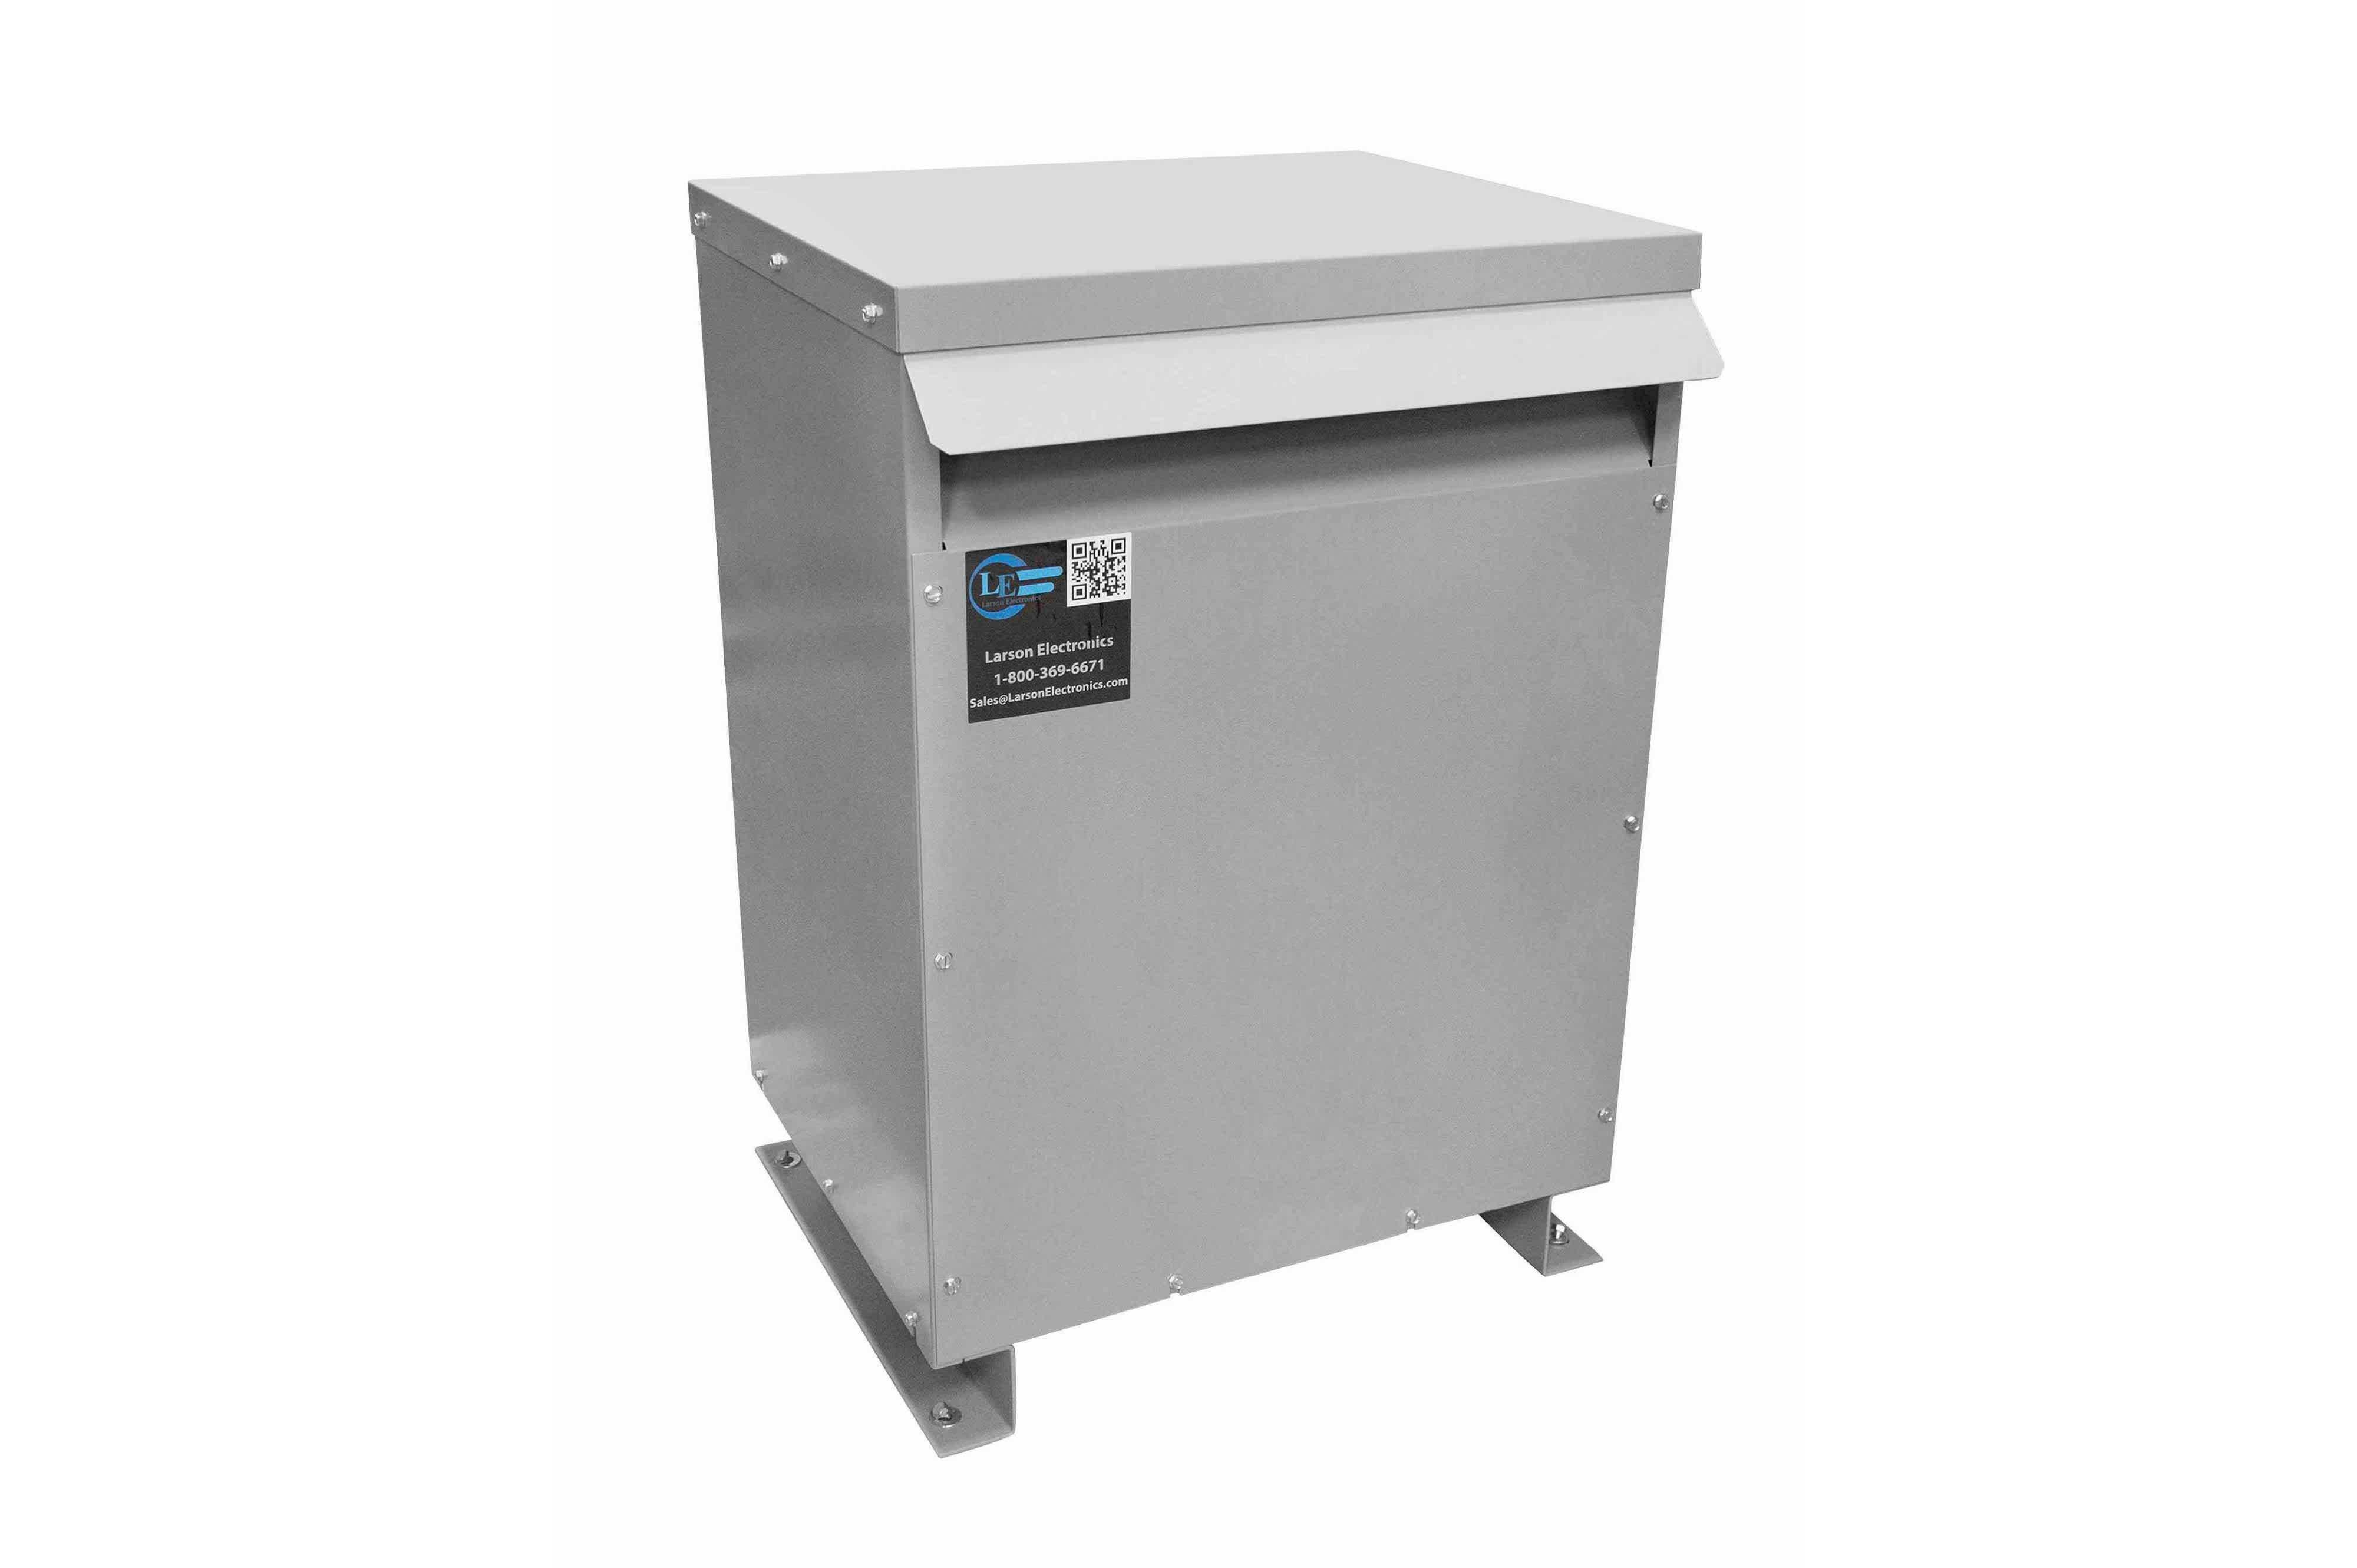 250 kVA 3PH Isolation Transformer, 460V Wye Primary, 575Y/332 Wye-N Secondary, N3R, Ventilated, 60 Hz